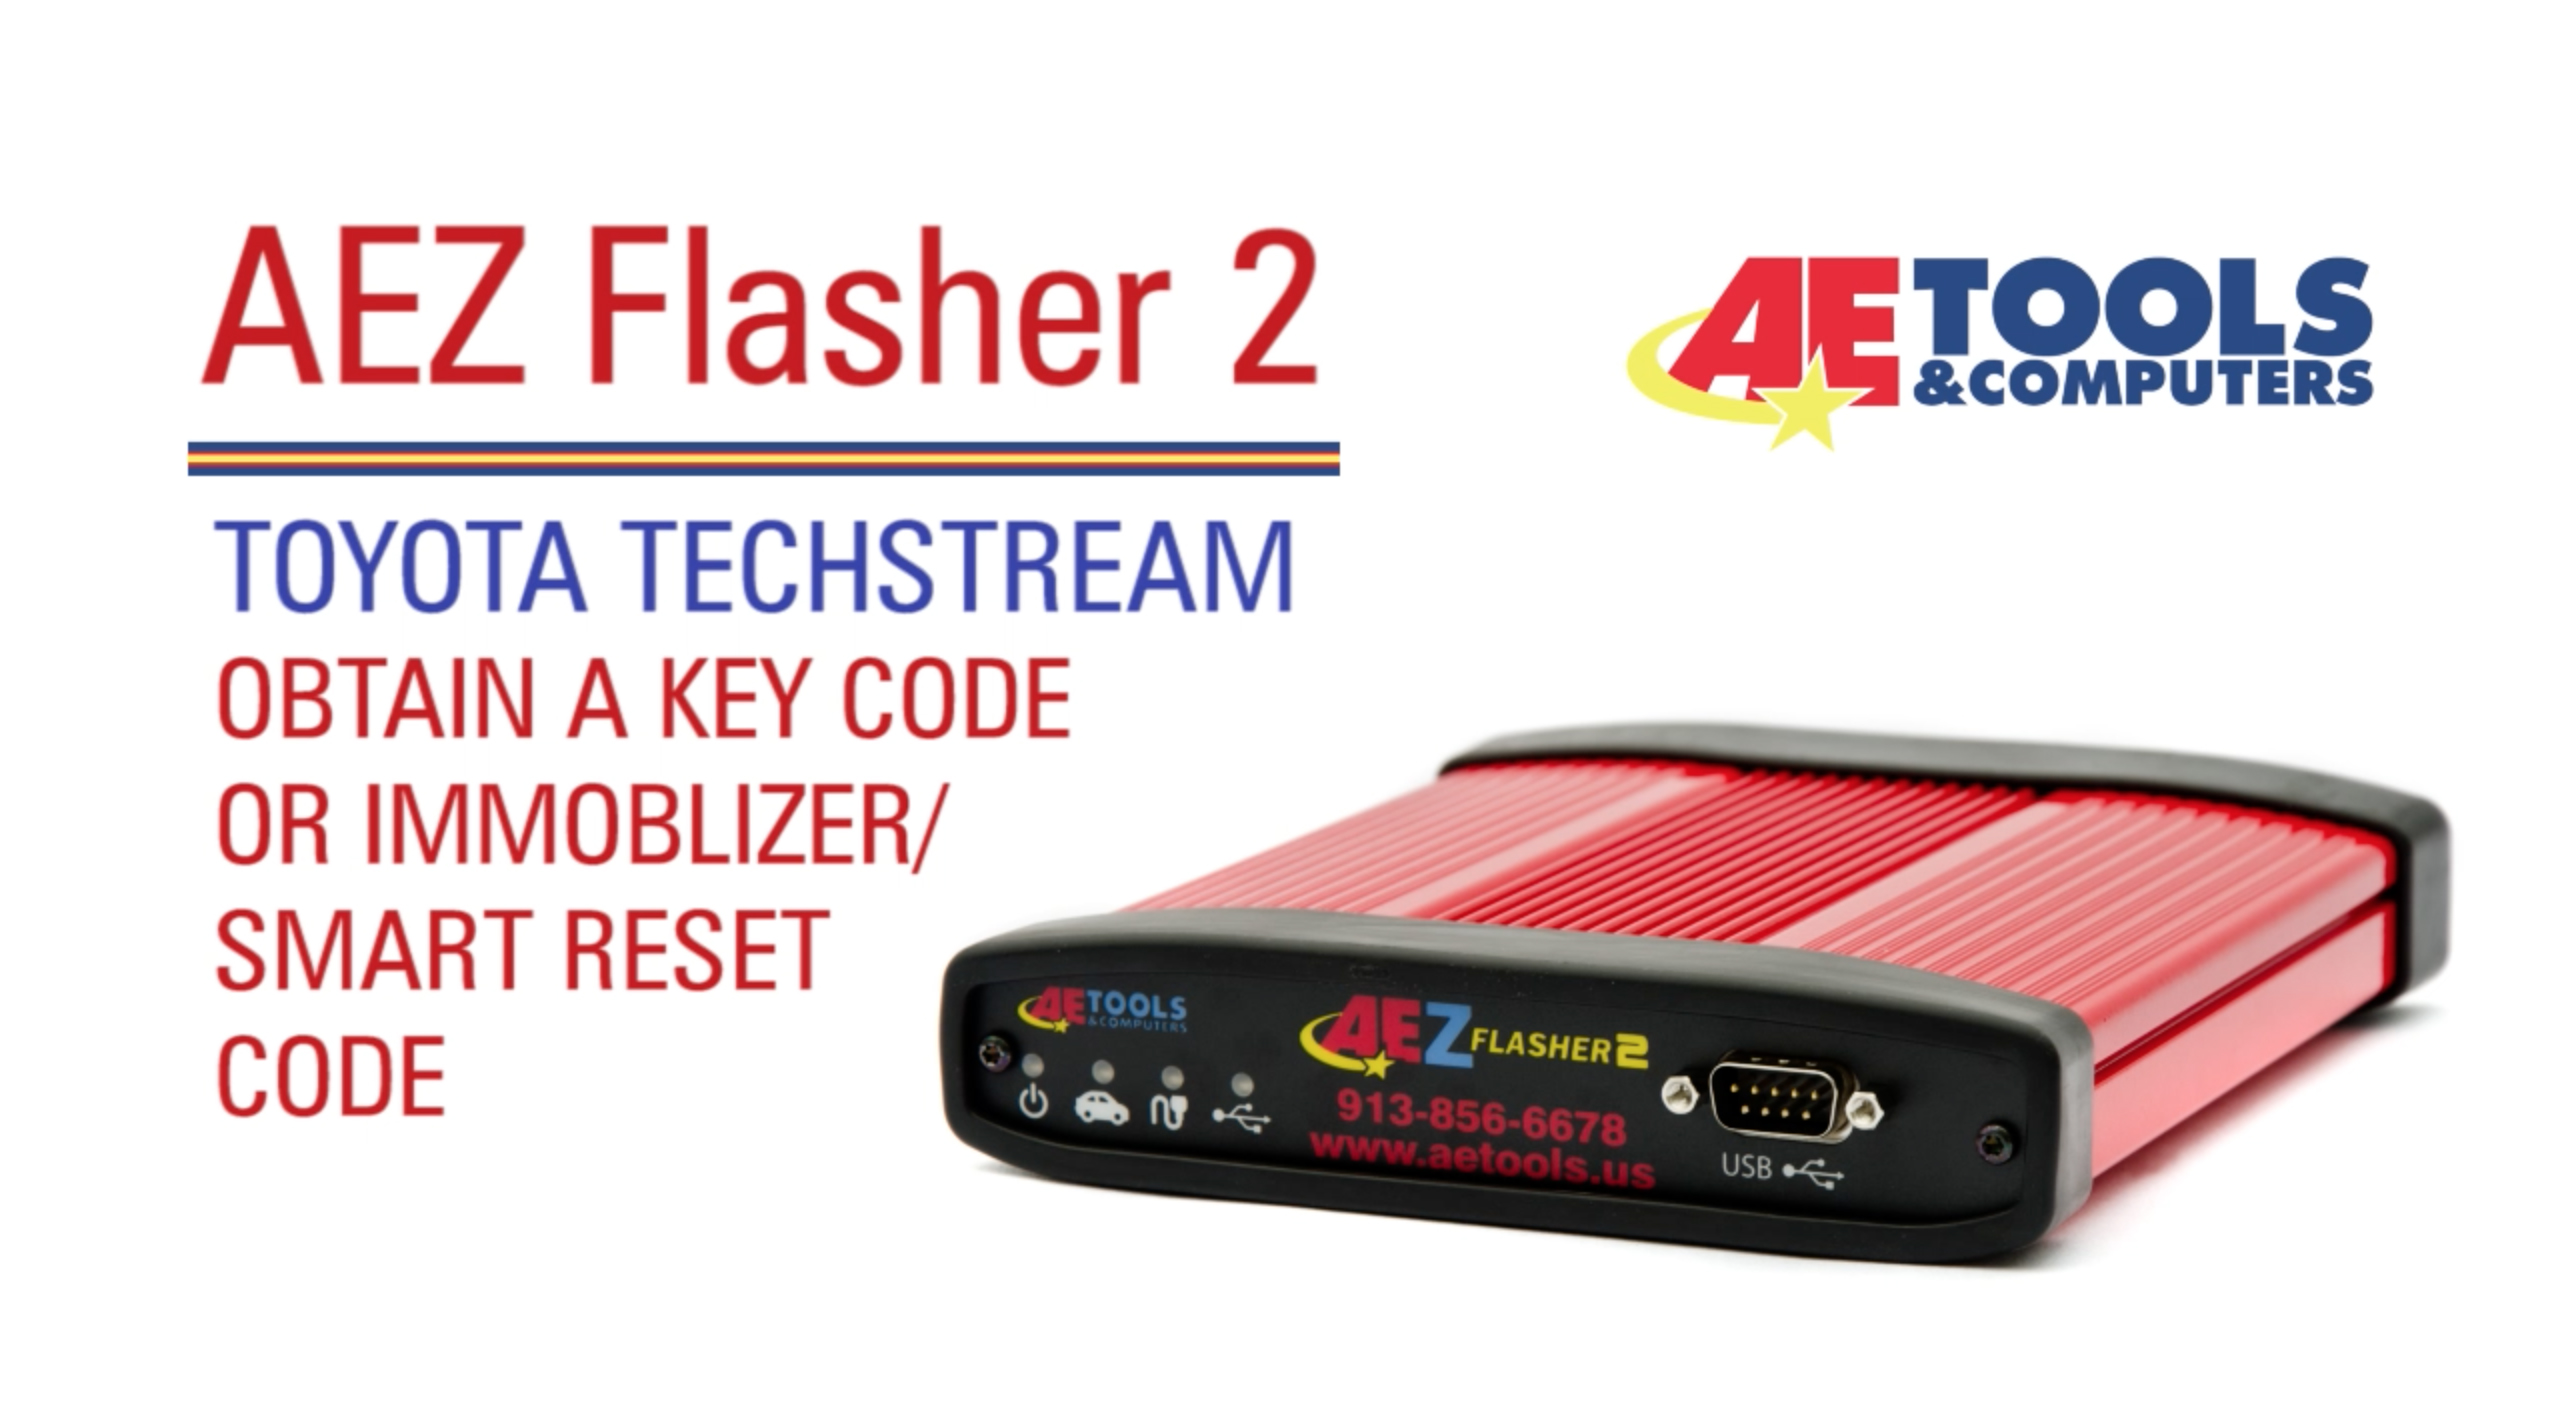 AET-037_AEZ FLasher 2: Toyota Techstream – Obtain a Key Code or Immoblizer  / Smart Reset Code